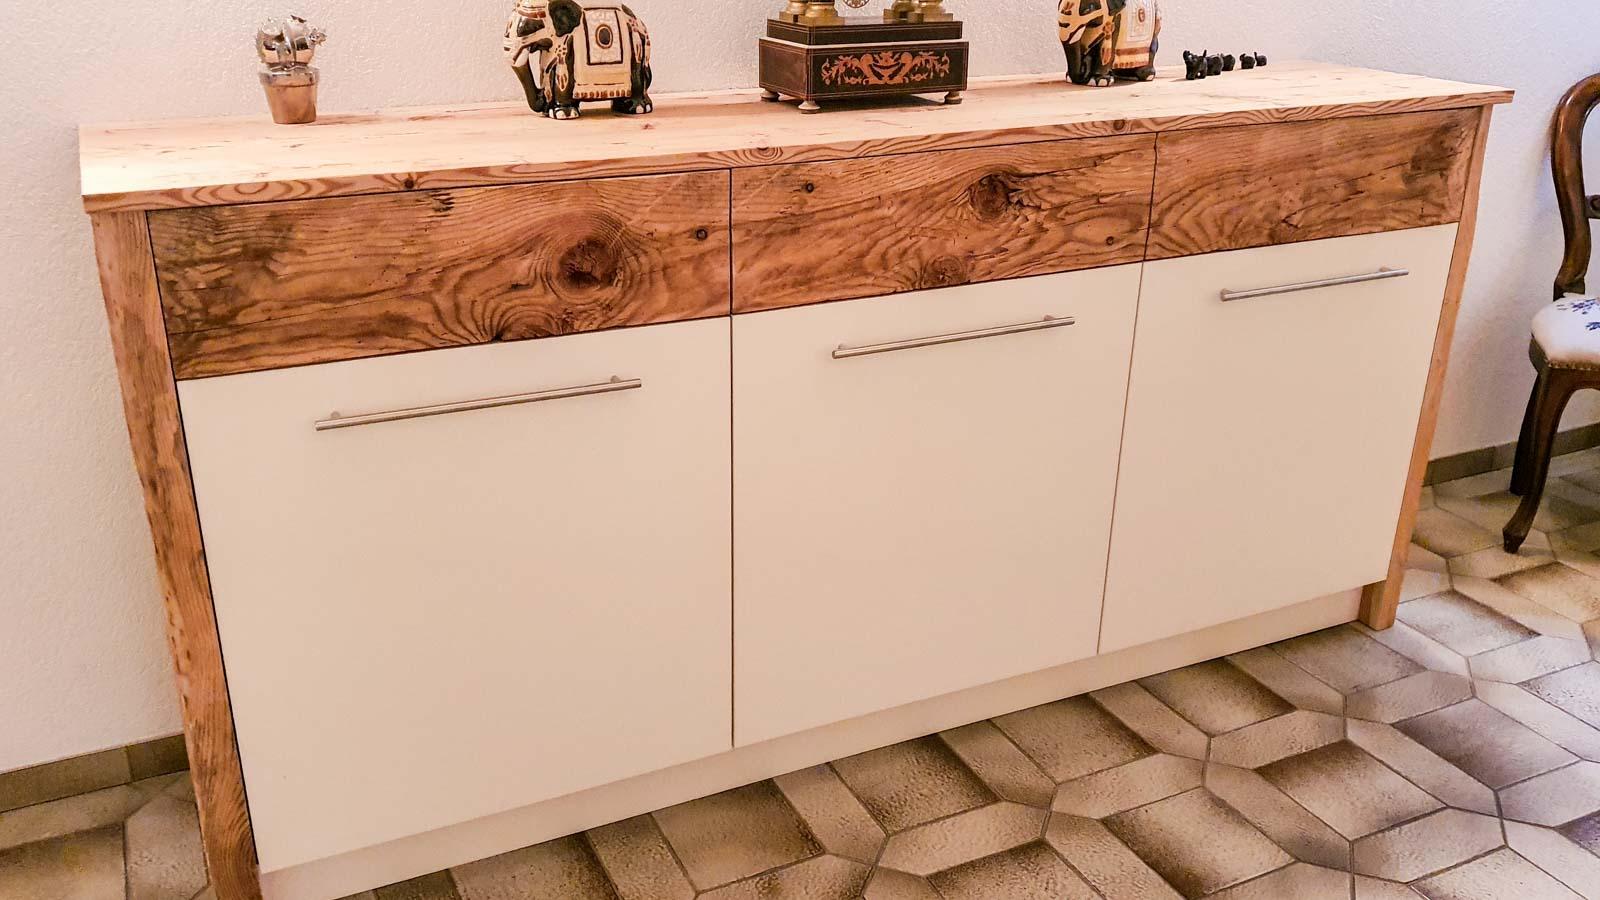 Wooddesign_Garderobe_Gästegarderobe_rustikal_Altholz_Sitzbank_Edelstahl (5)